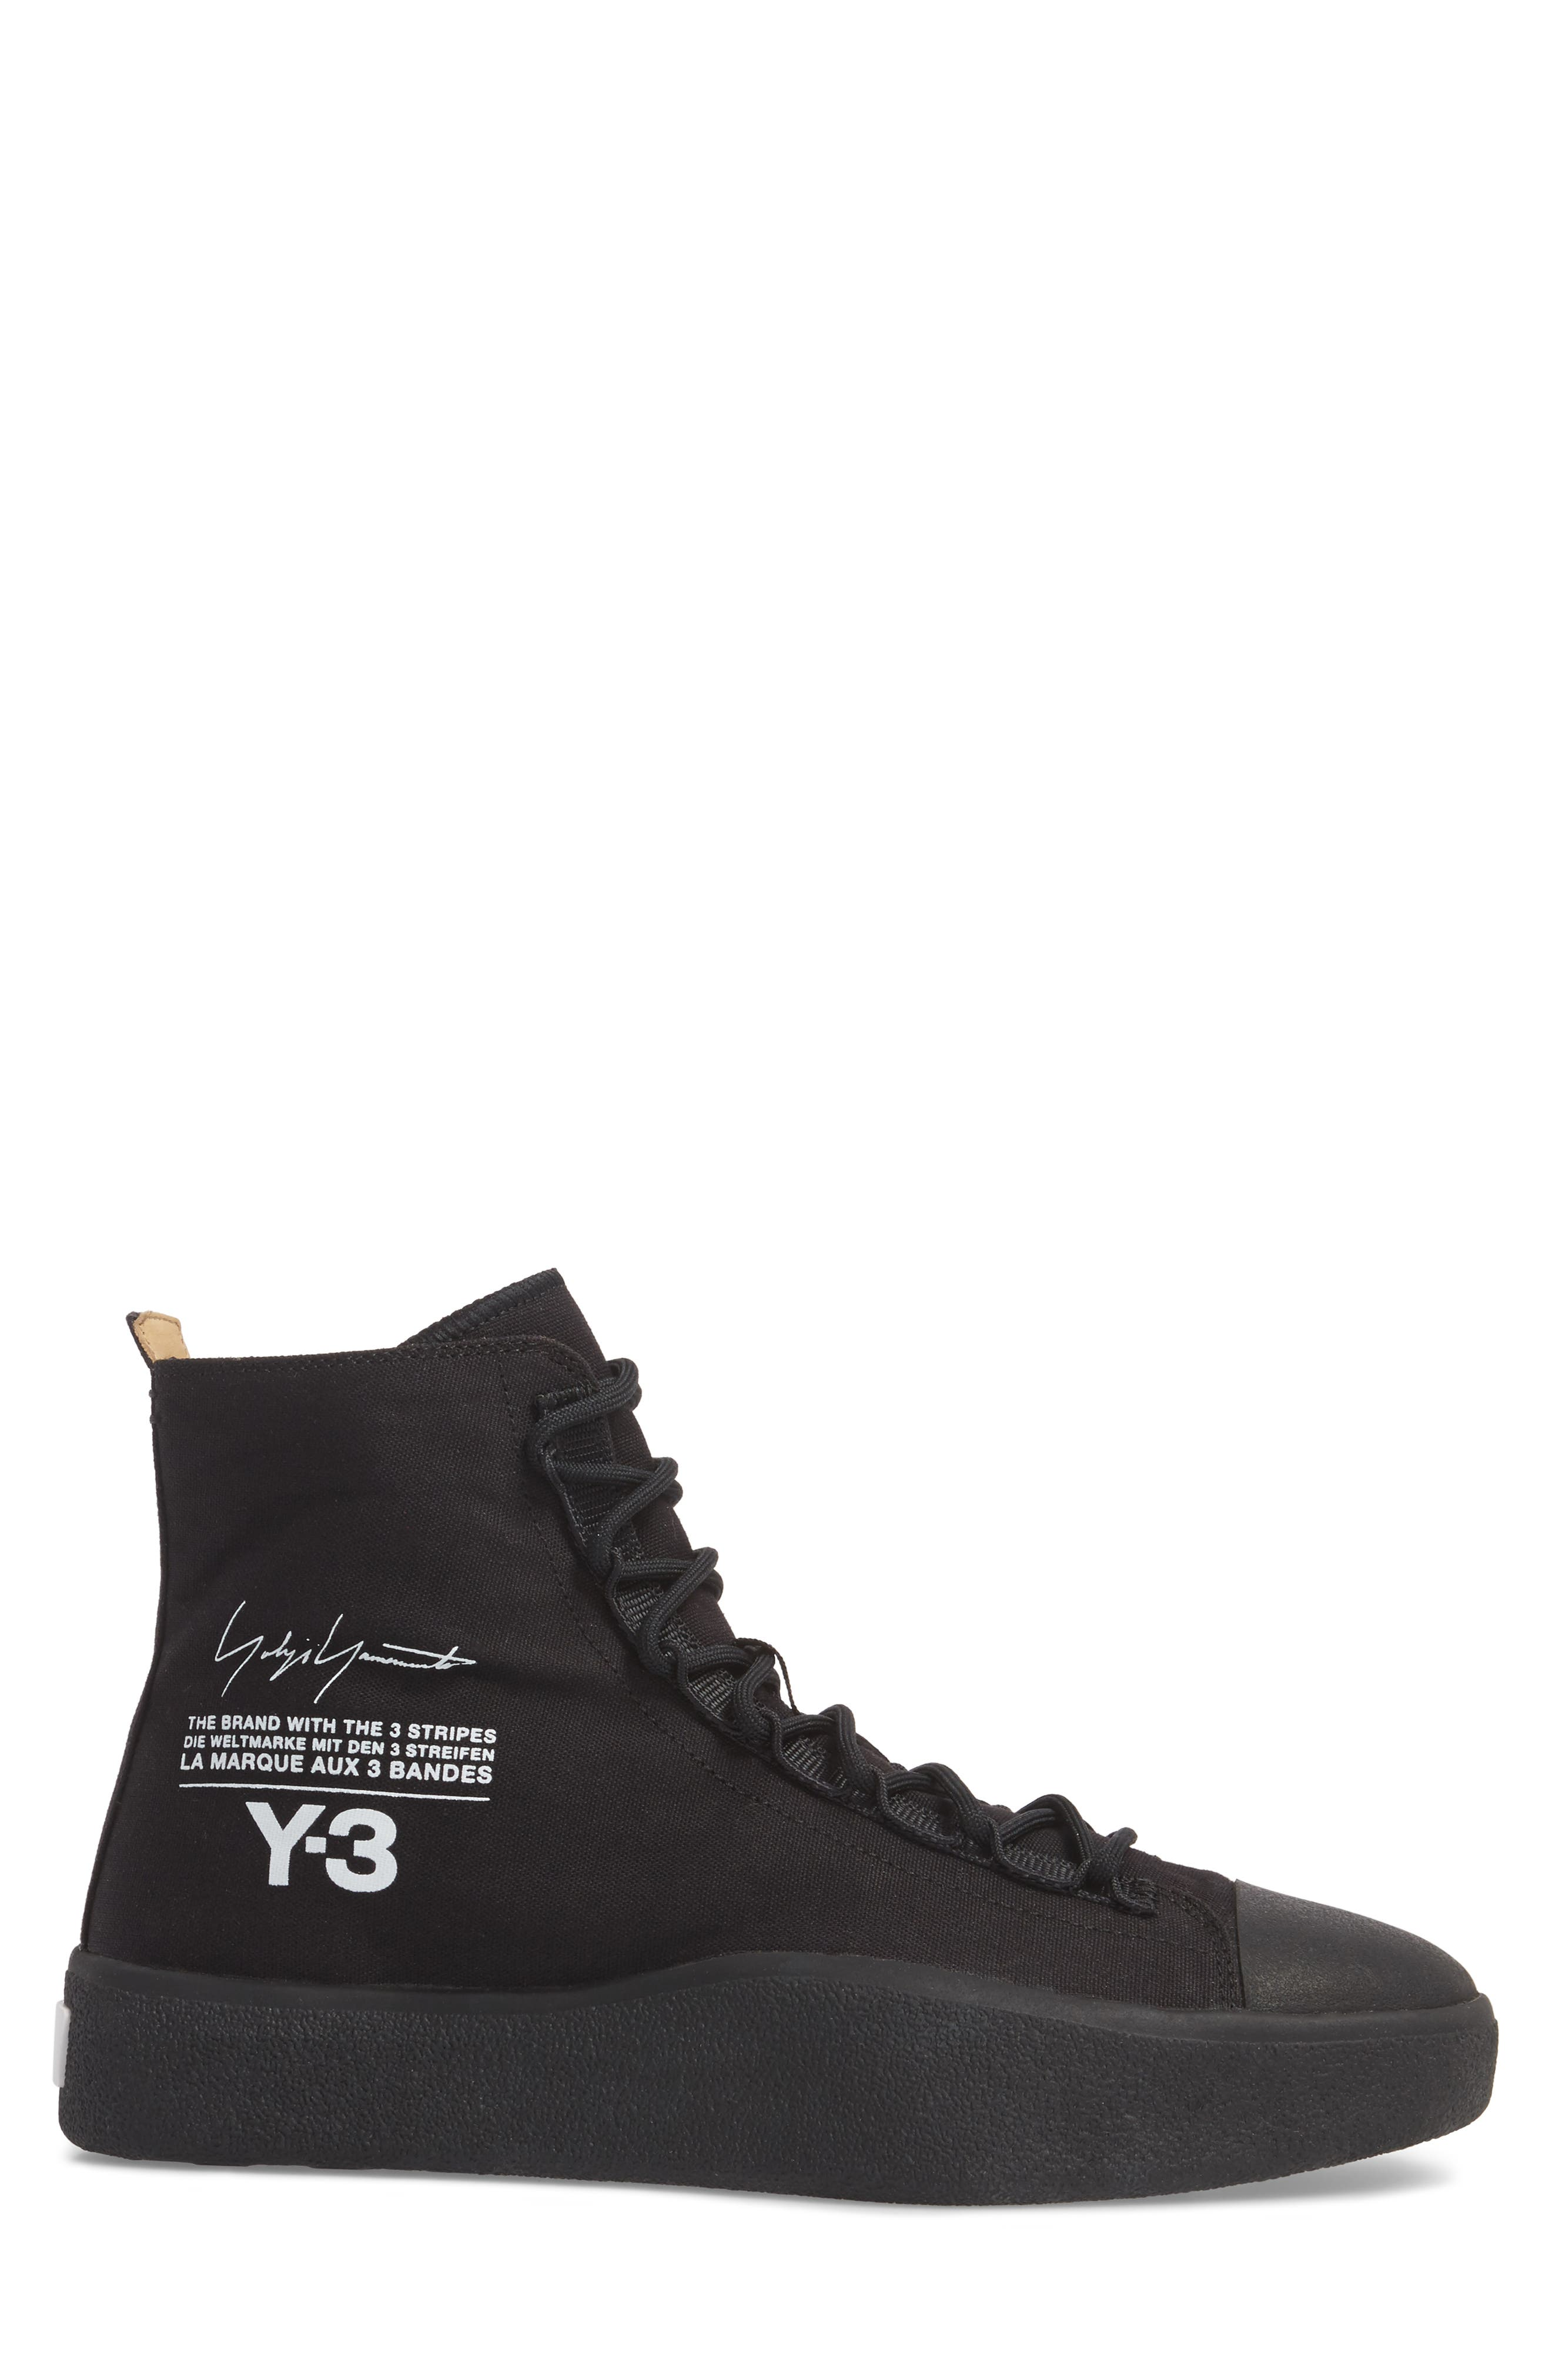 x adidas Bashyo High Top Sneaker,                             Alternate thumbnail 3, color,                             Black